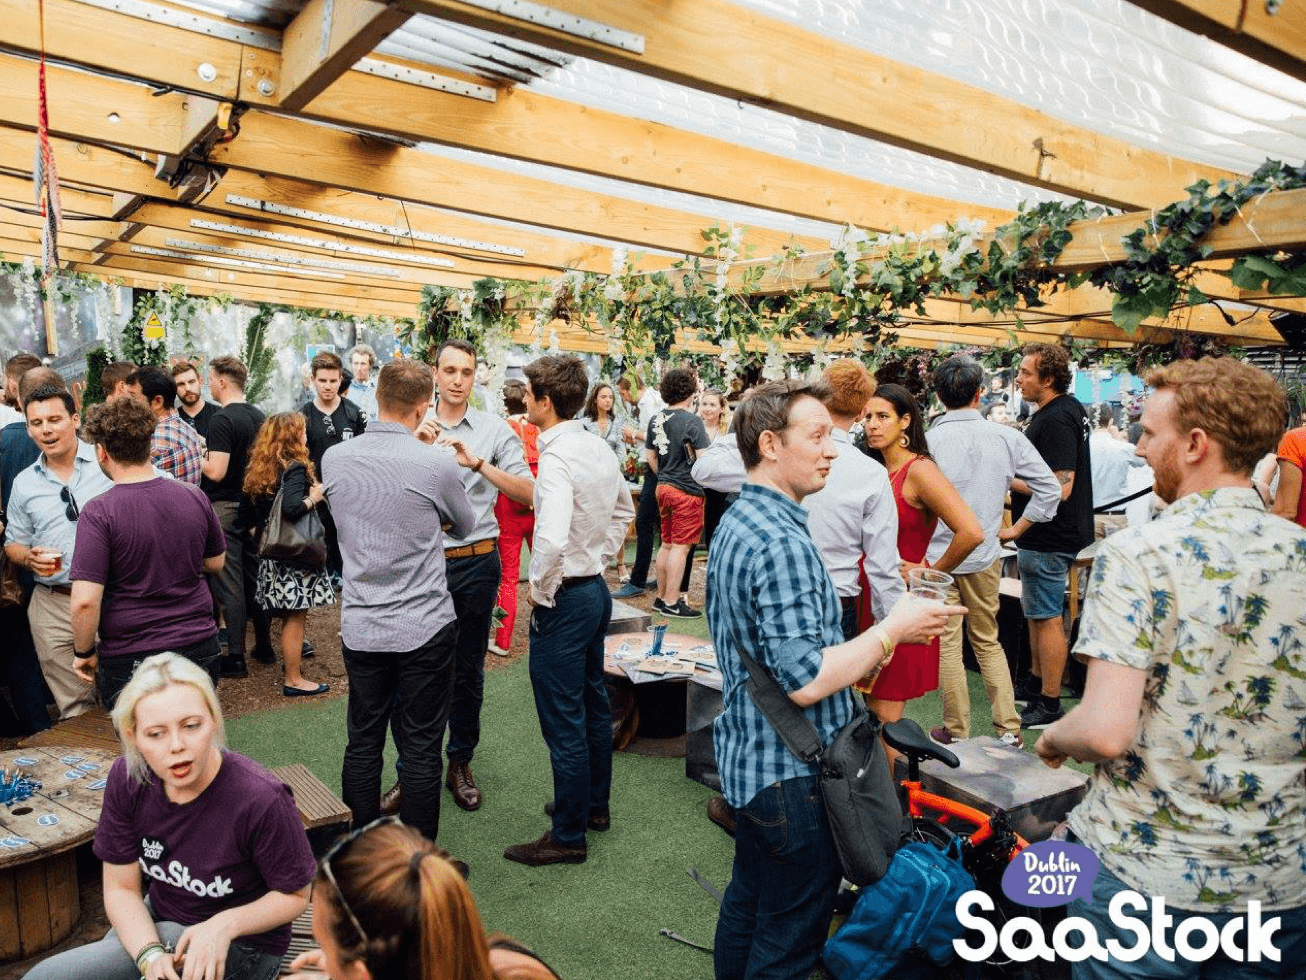 SaaStock Summer Party